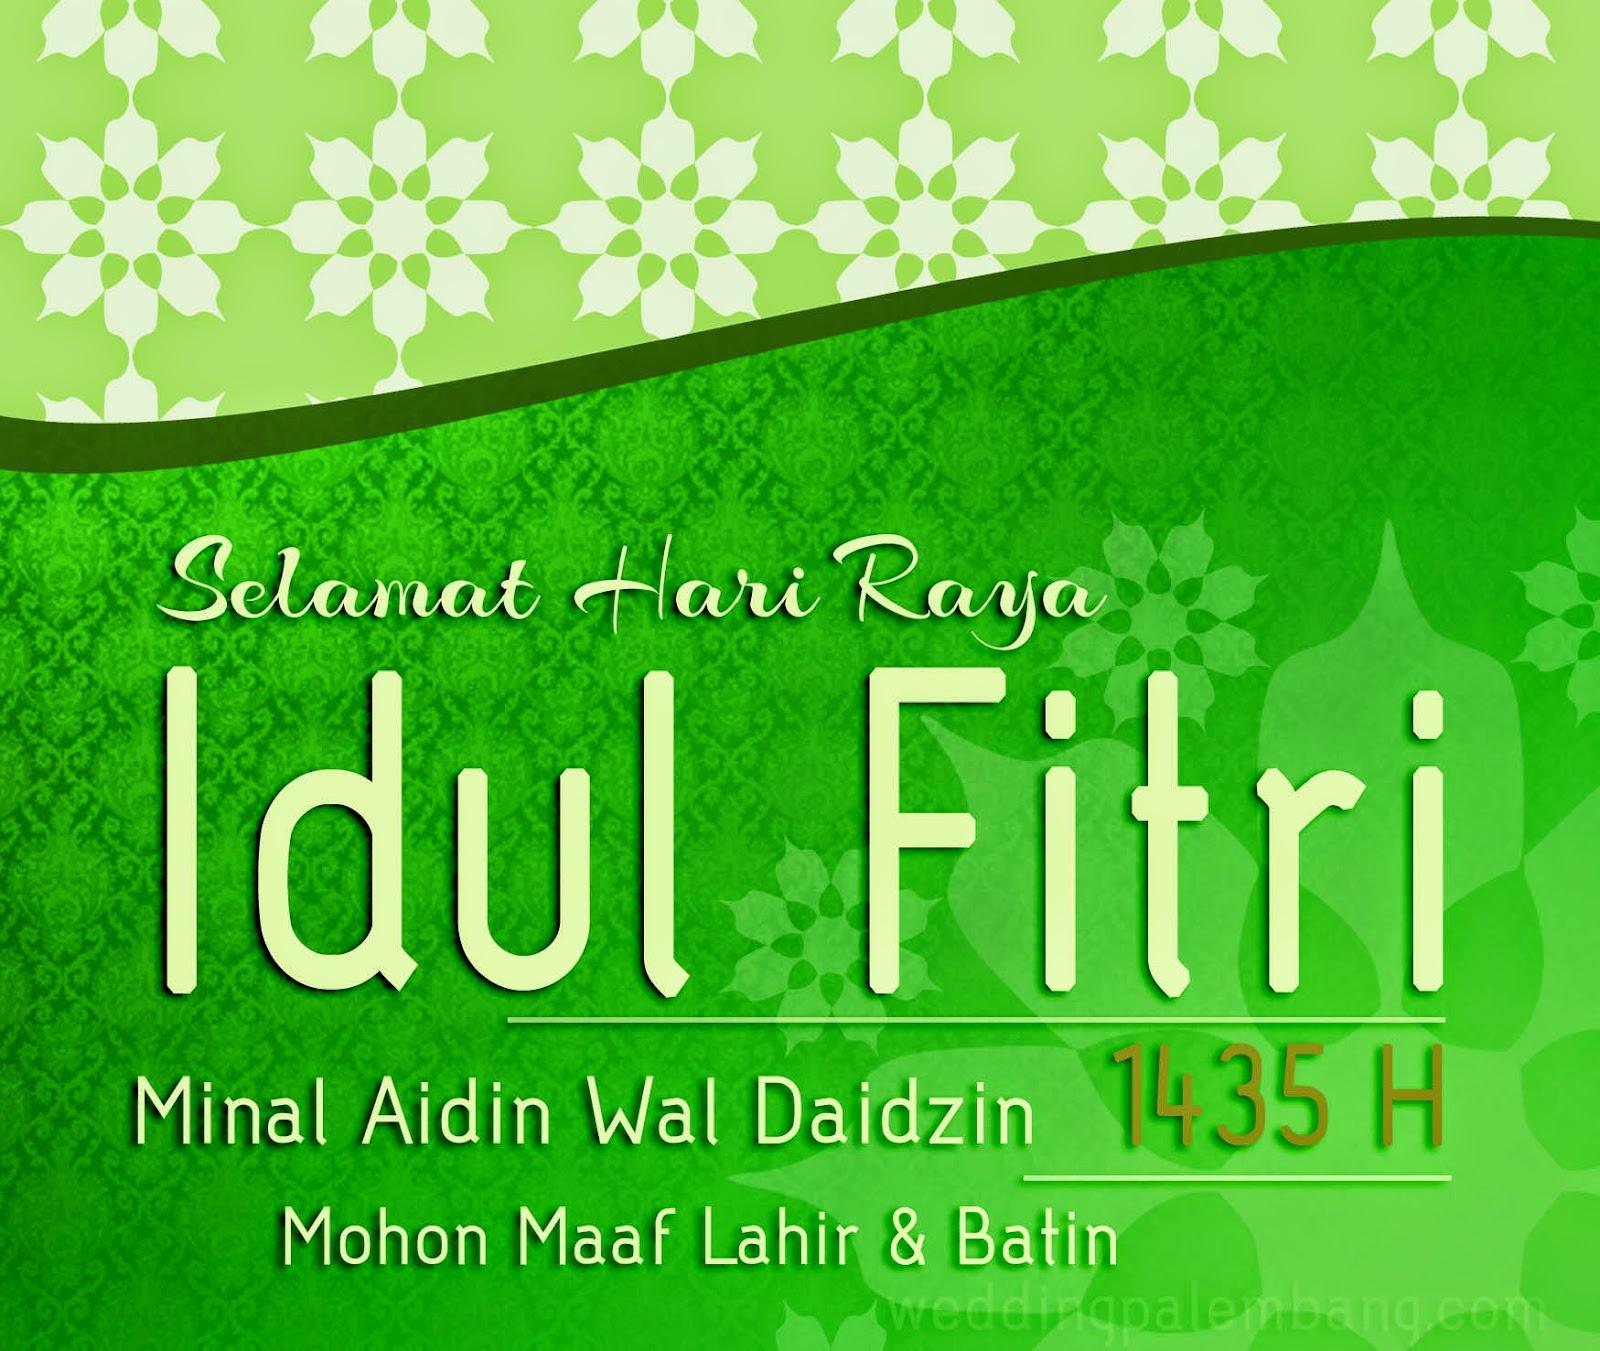 Koleksi Download Gambar Lucu Hari Raya Idul Fitri